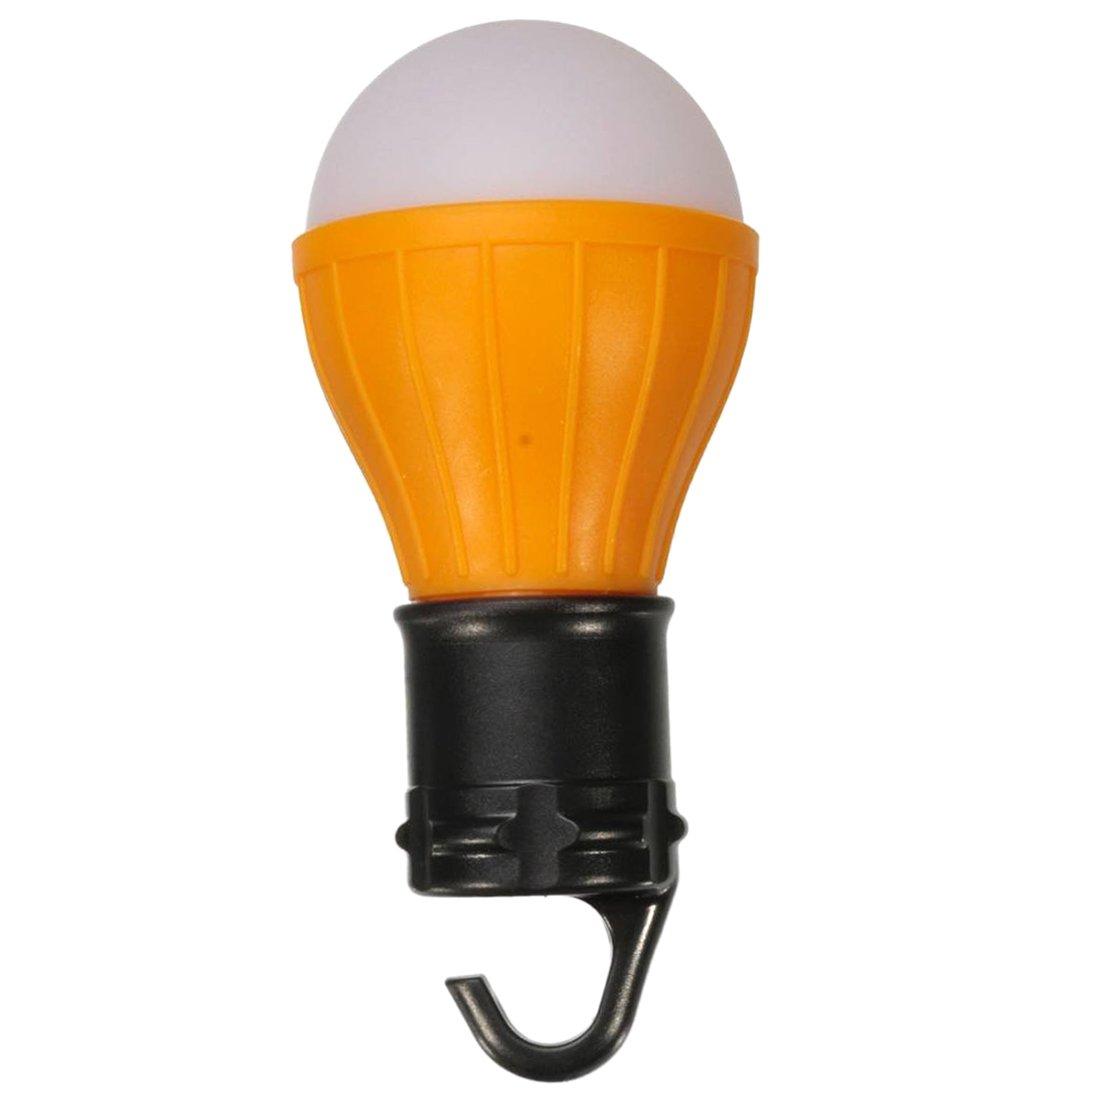 TOOGOO ( R )アウトドア3 LEDキャンピングランプバルブ球状プラスチック吊りランプテントランプ電球キャンプ、オレンジ部屋 B01JU3T4PY 16153